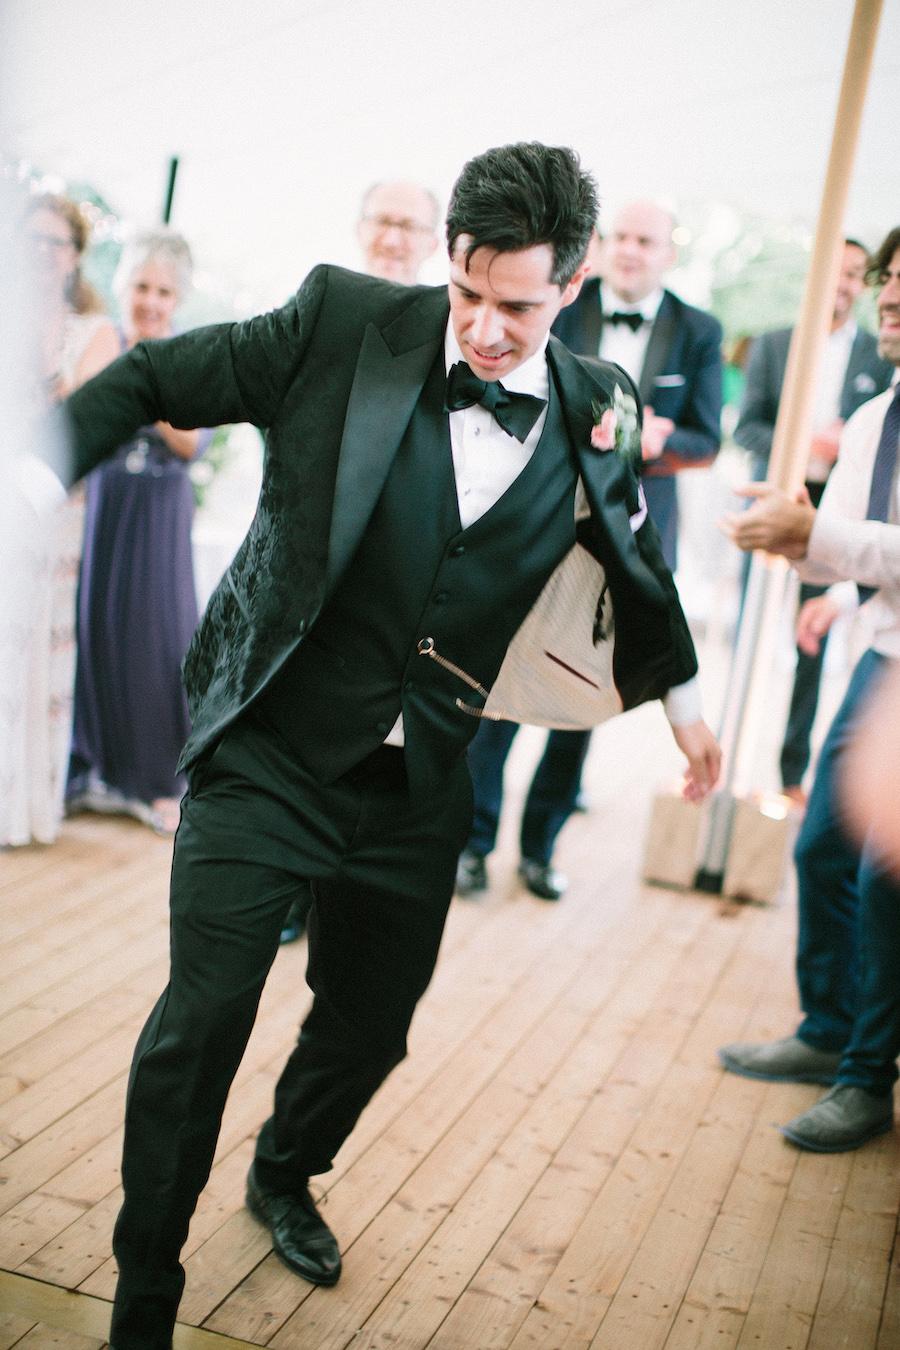 saya-photography-jewish-wedding-provence-rustic-lourmarin-le-galinier-48.jpg